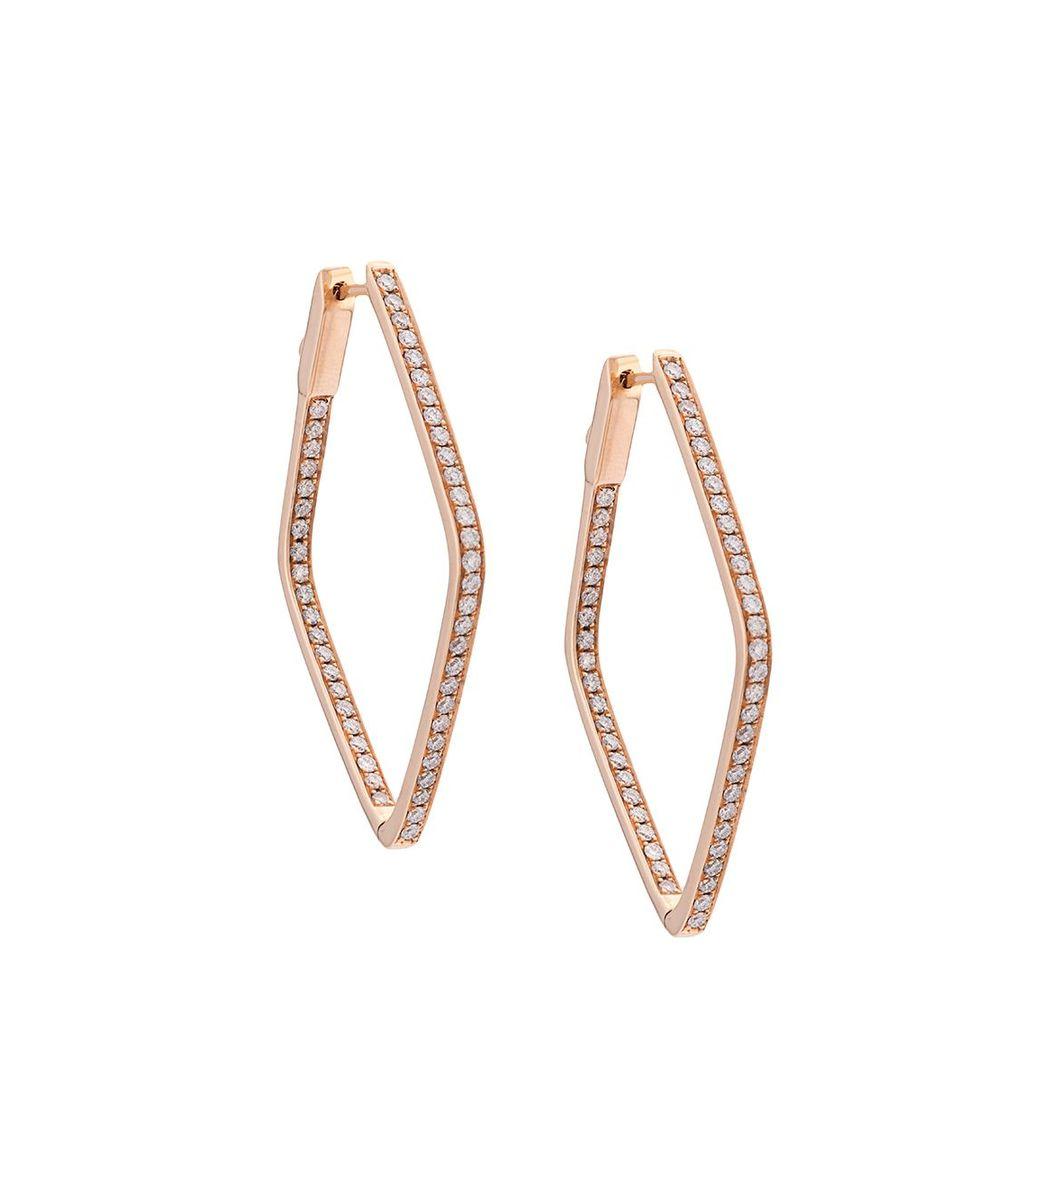 Anita Ko Gold Diamond Shaped Hoops